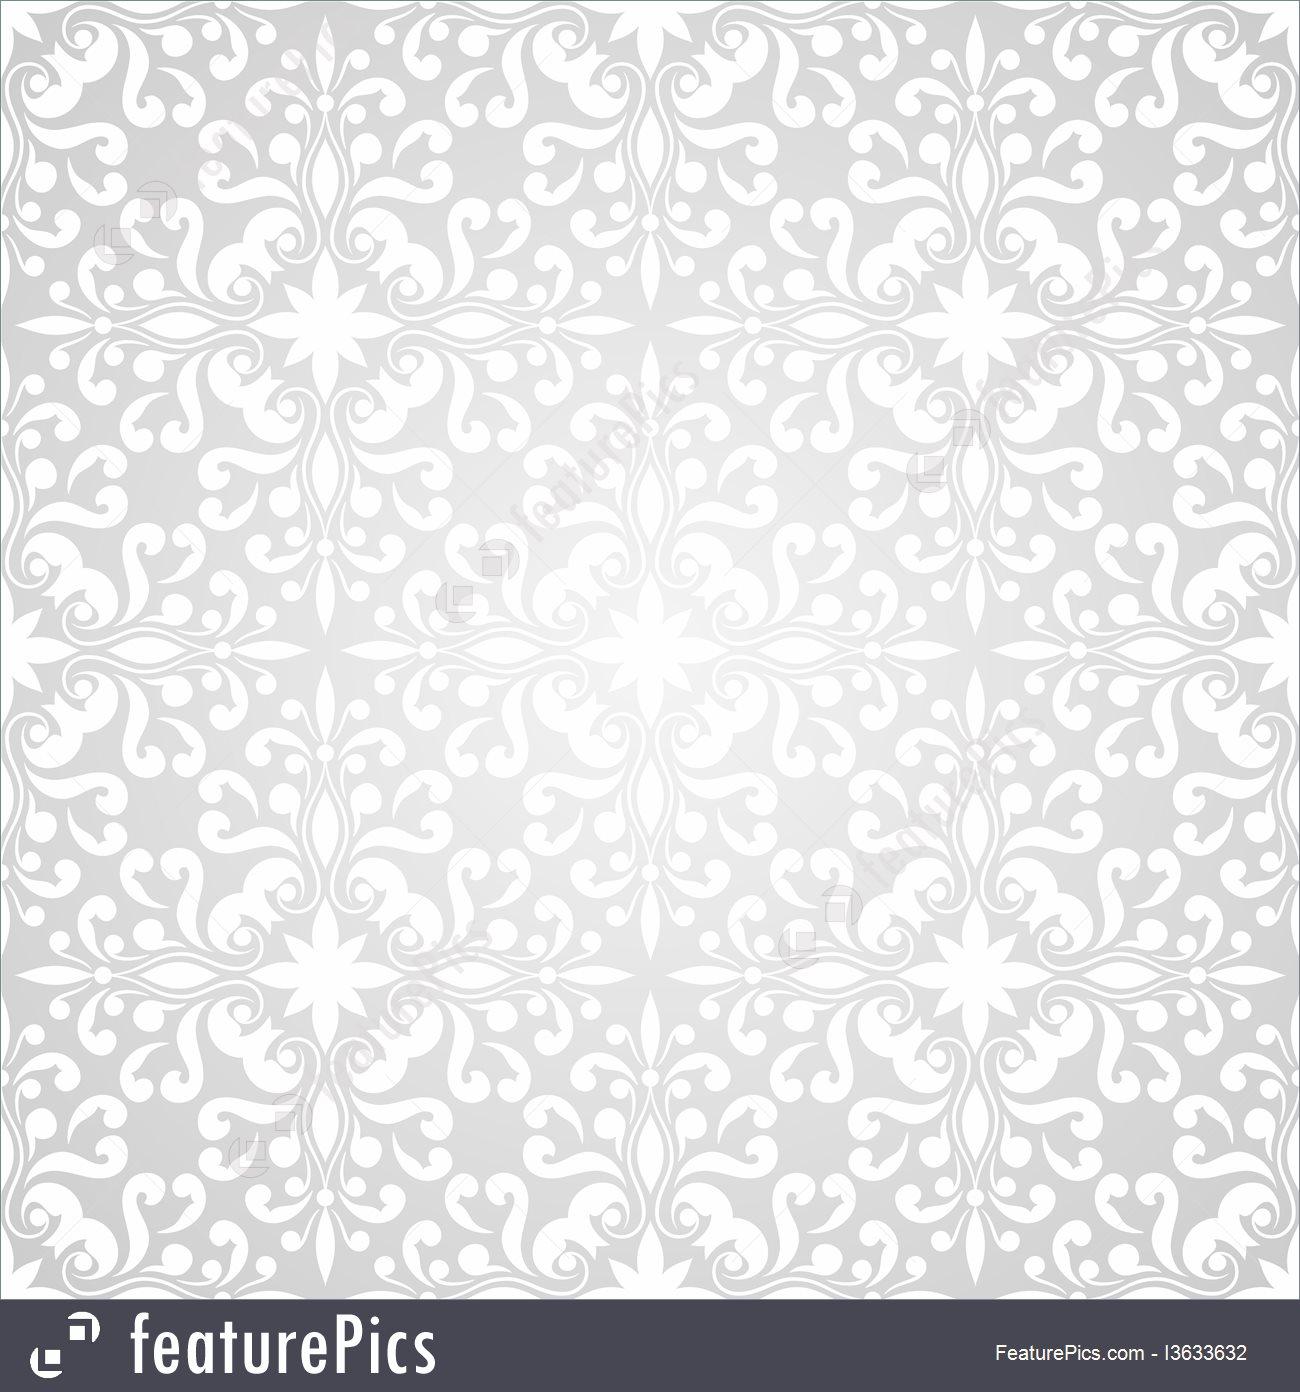 Floral Wallpaper Vector At Getdrawings Free Download